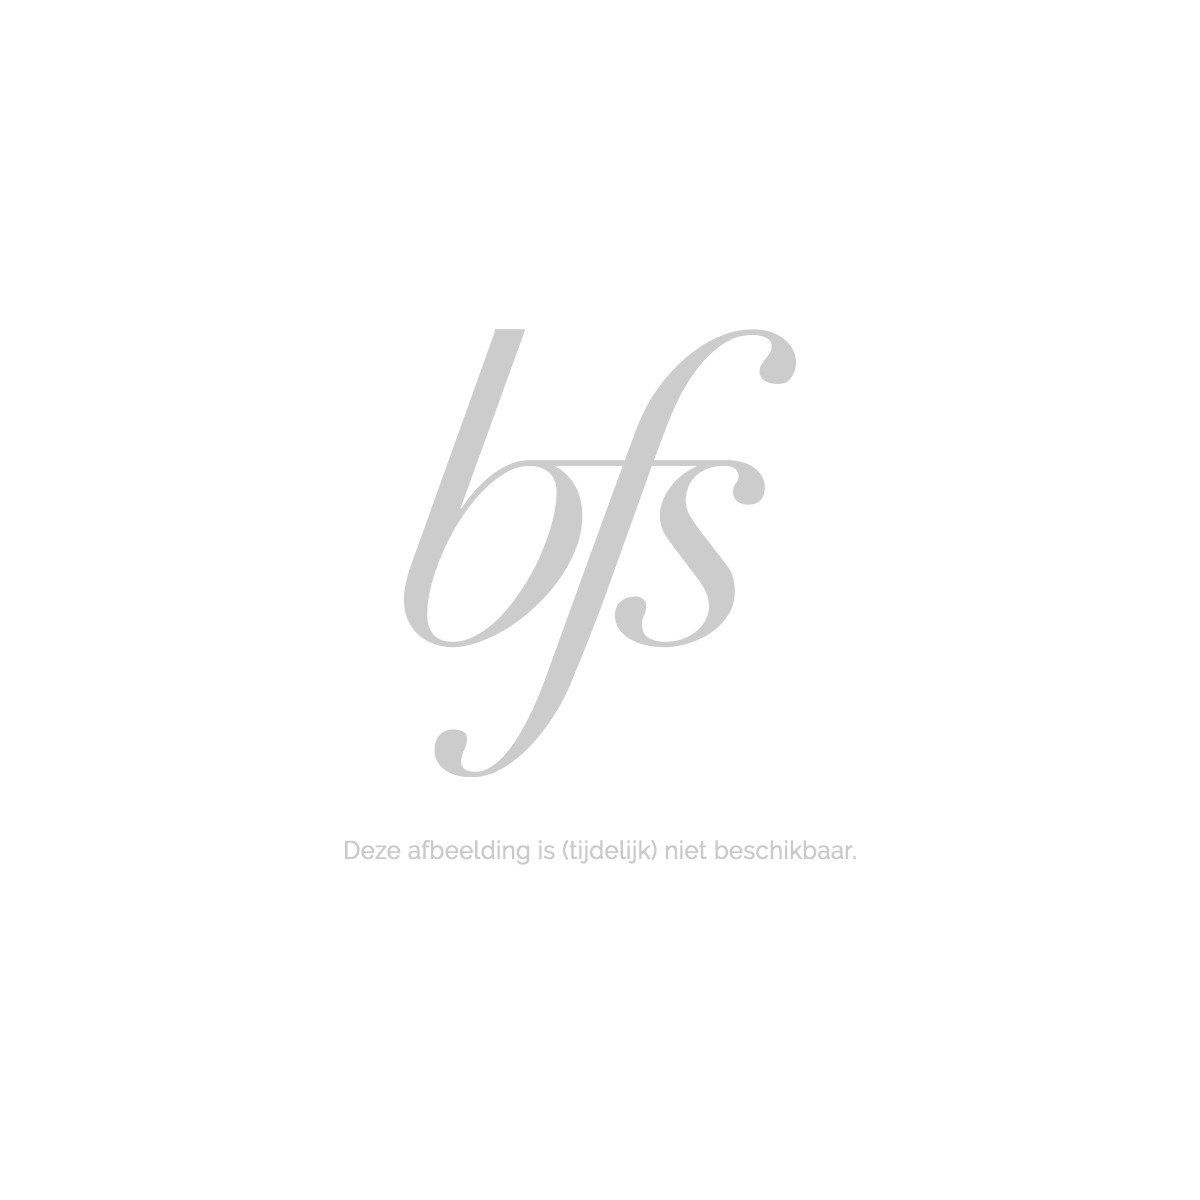 Givenchy Gentleman Eau De Toilette Spray (2) 100 Ml